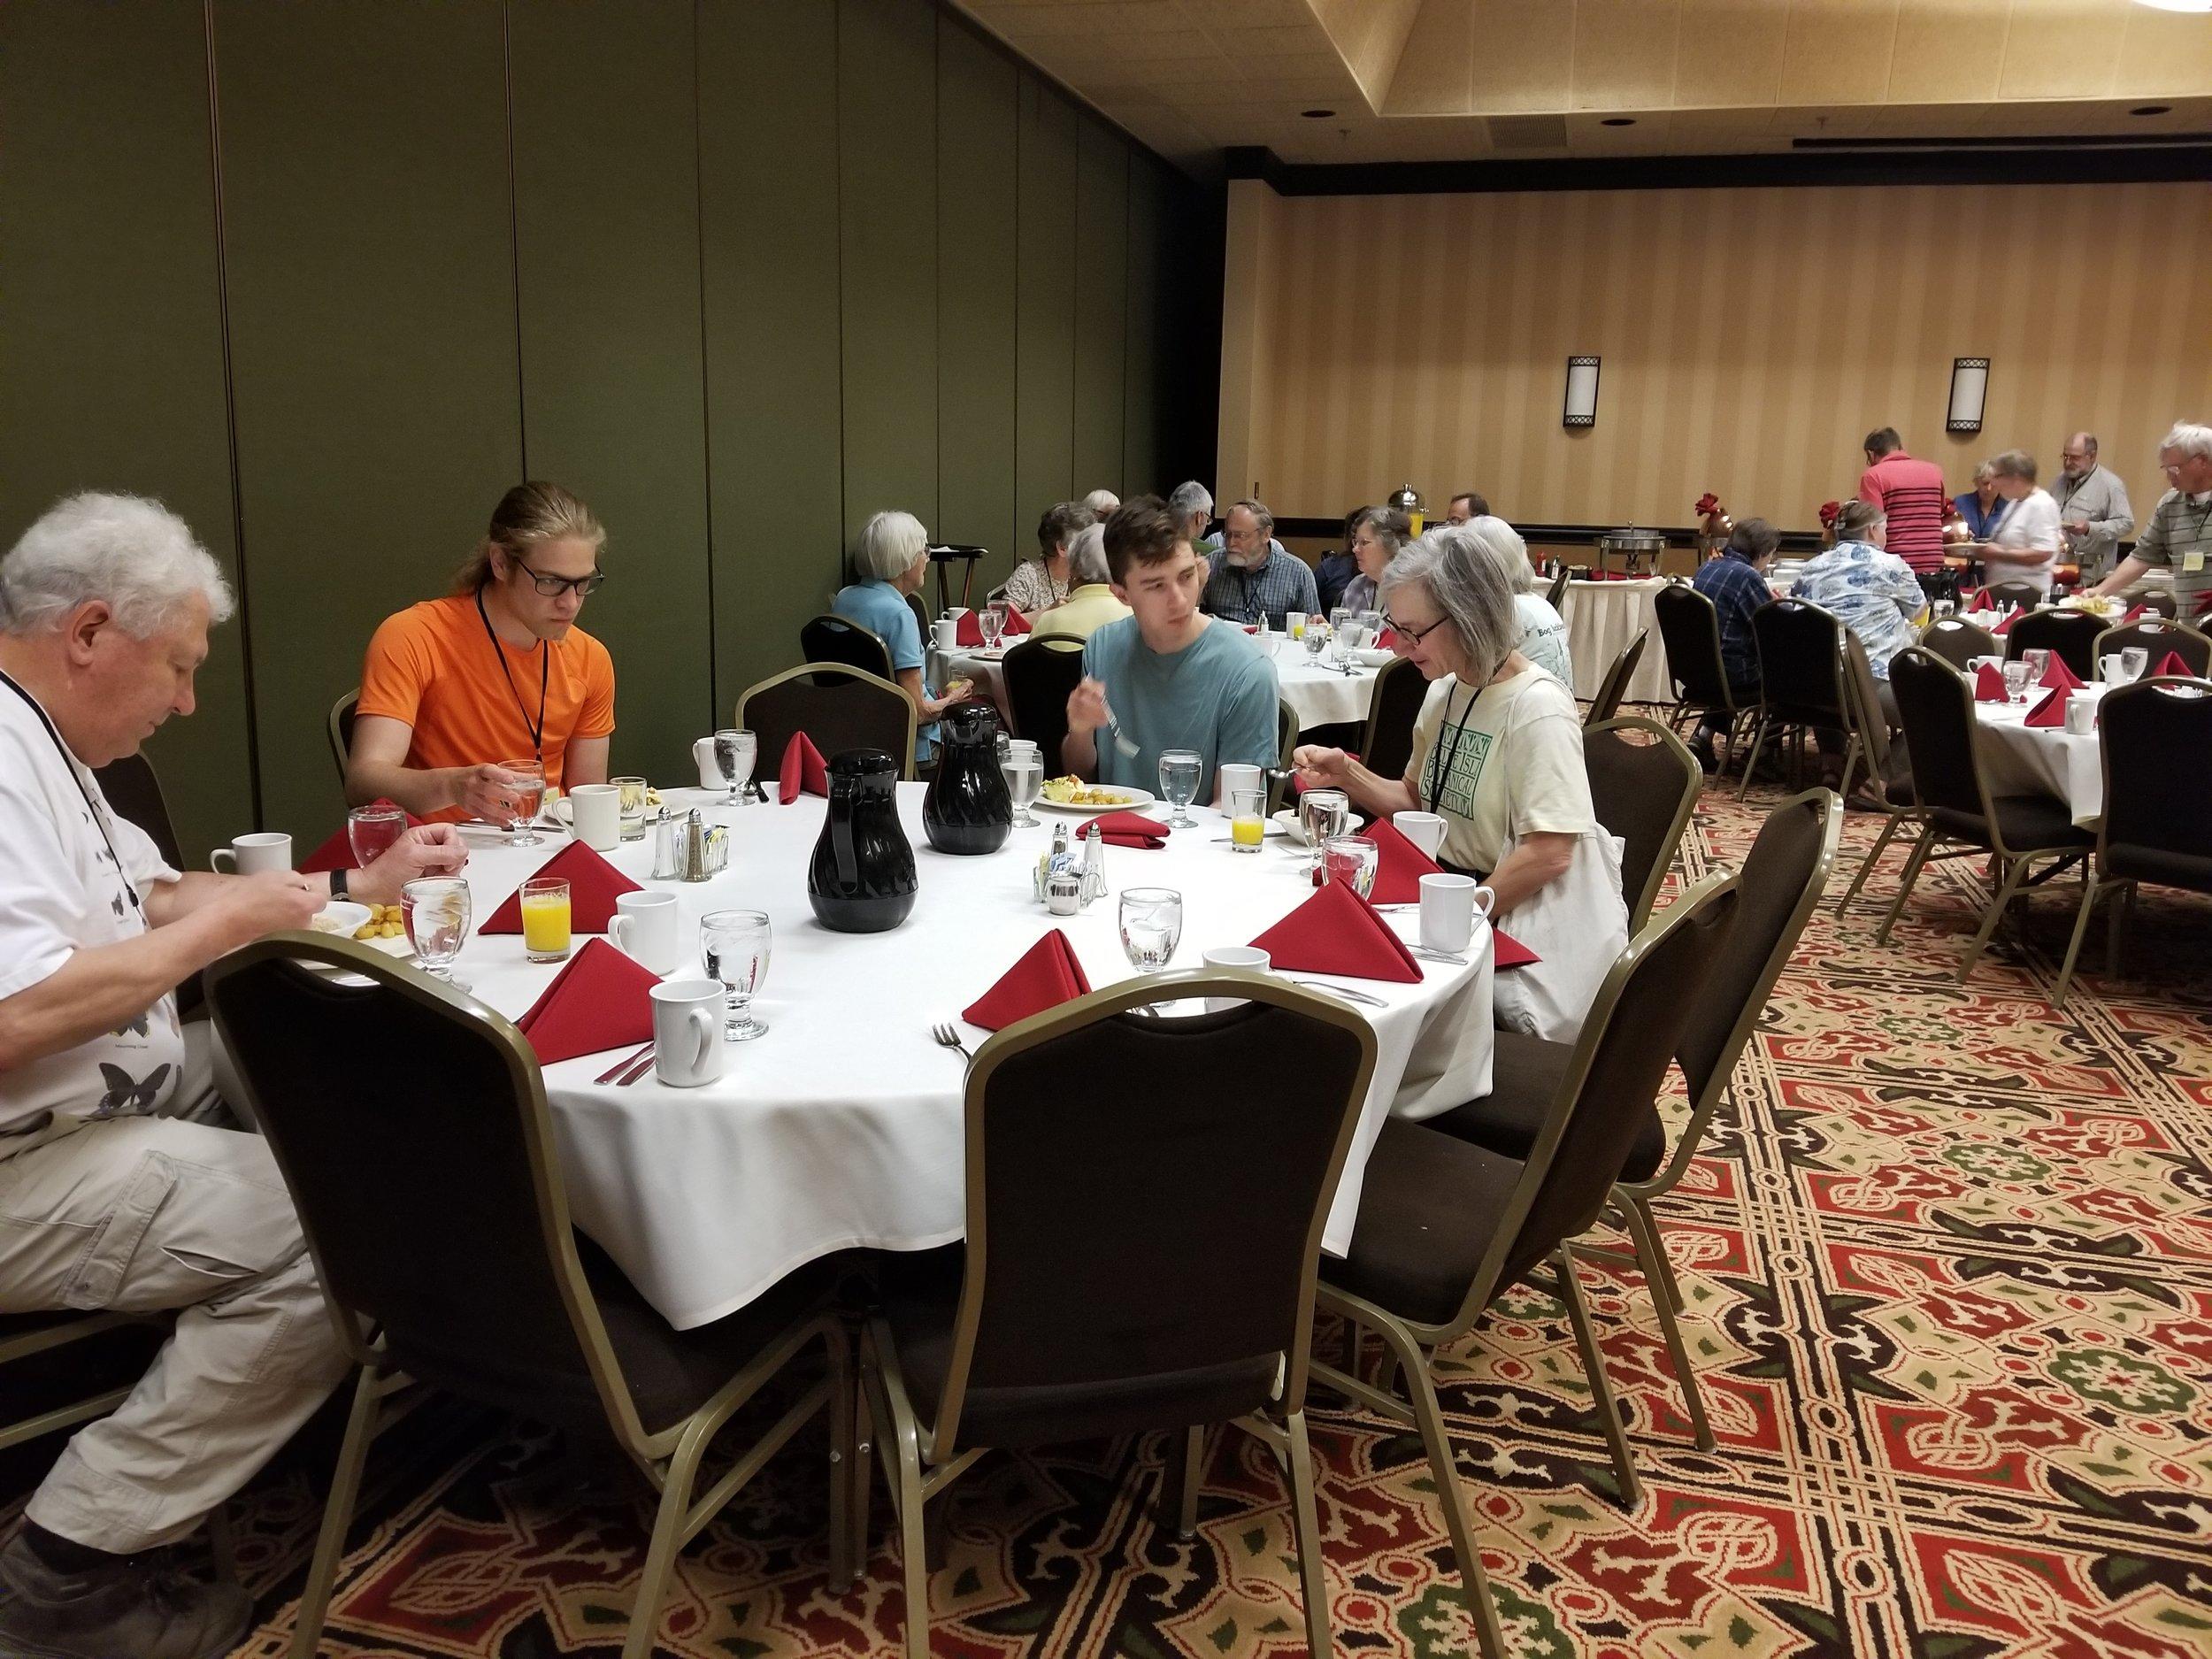 Breakfast tables  2018 5-27 Ethan Jacobs.jpg